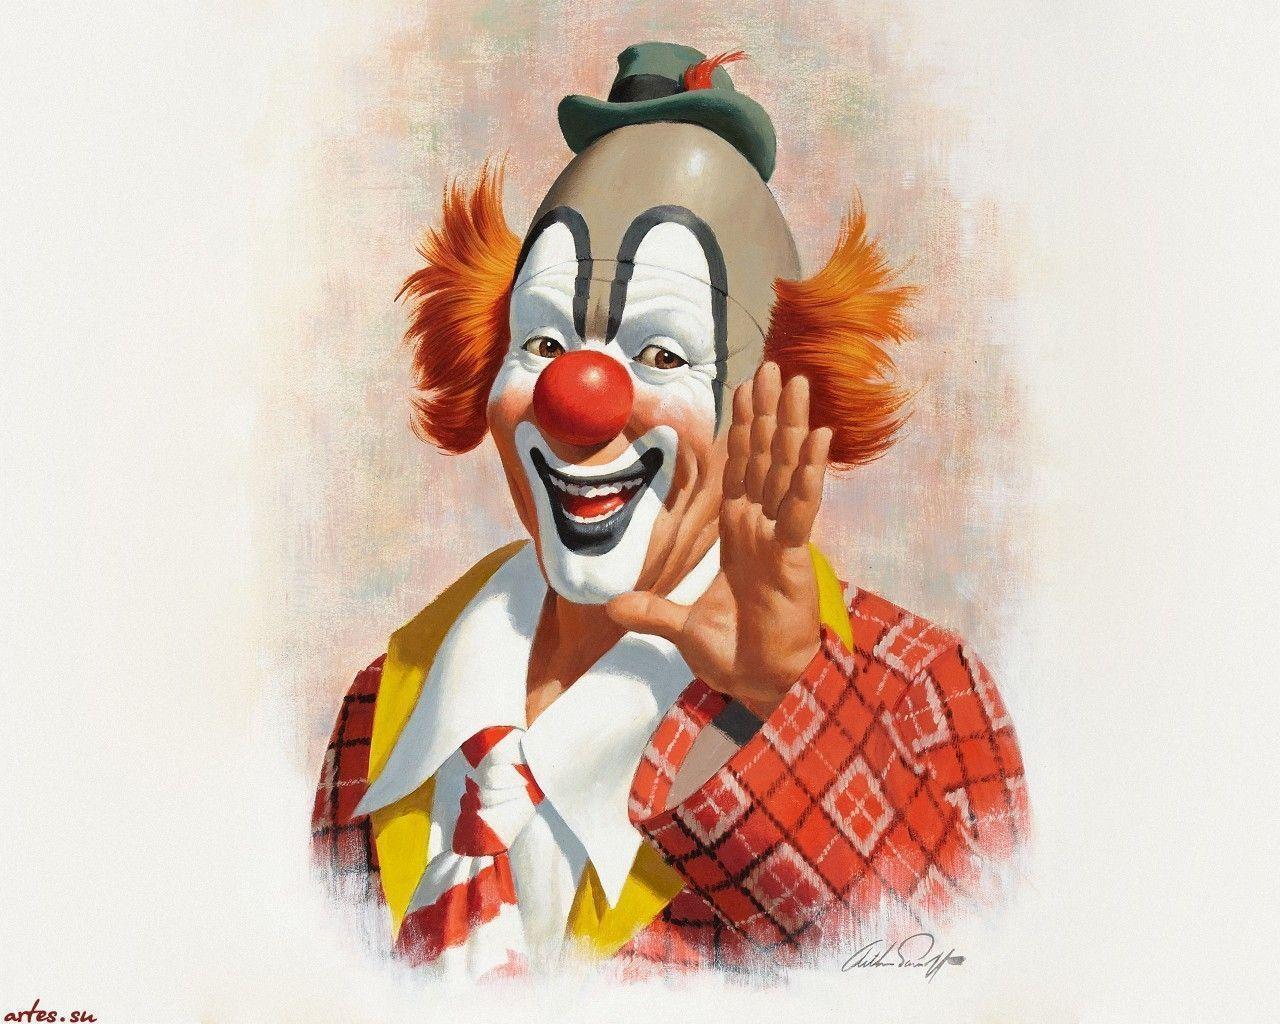 Clown wallpapers wallpaper cave - Circus joker wallpaper ...